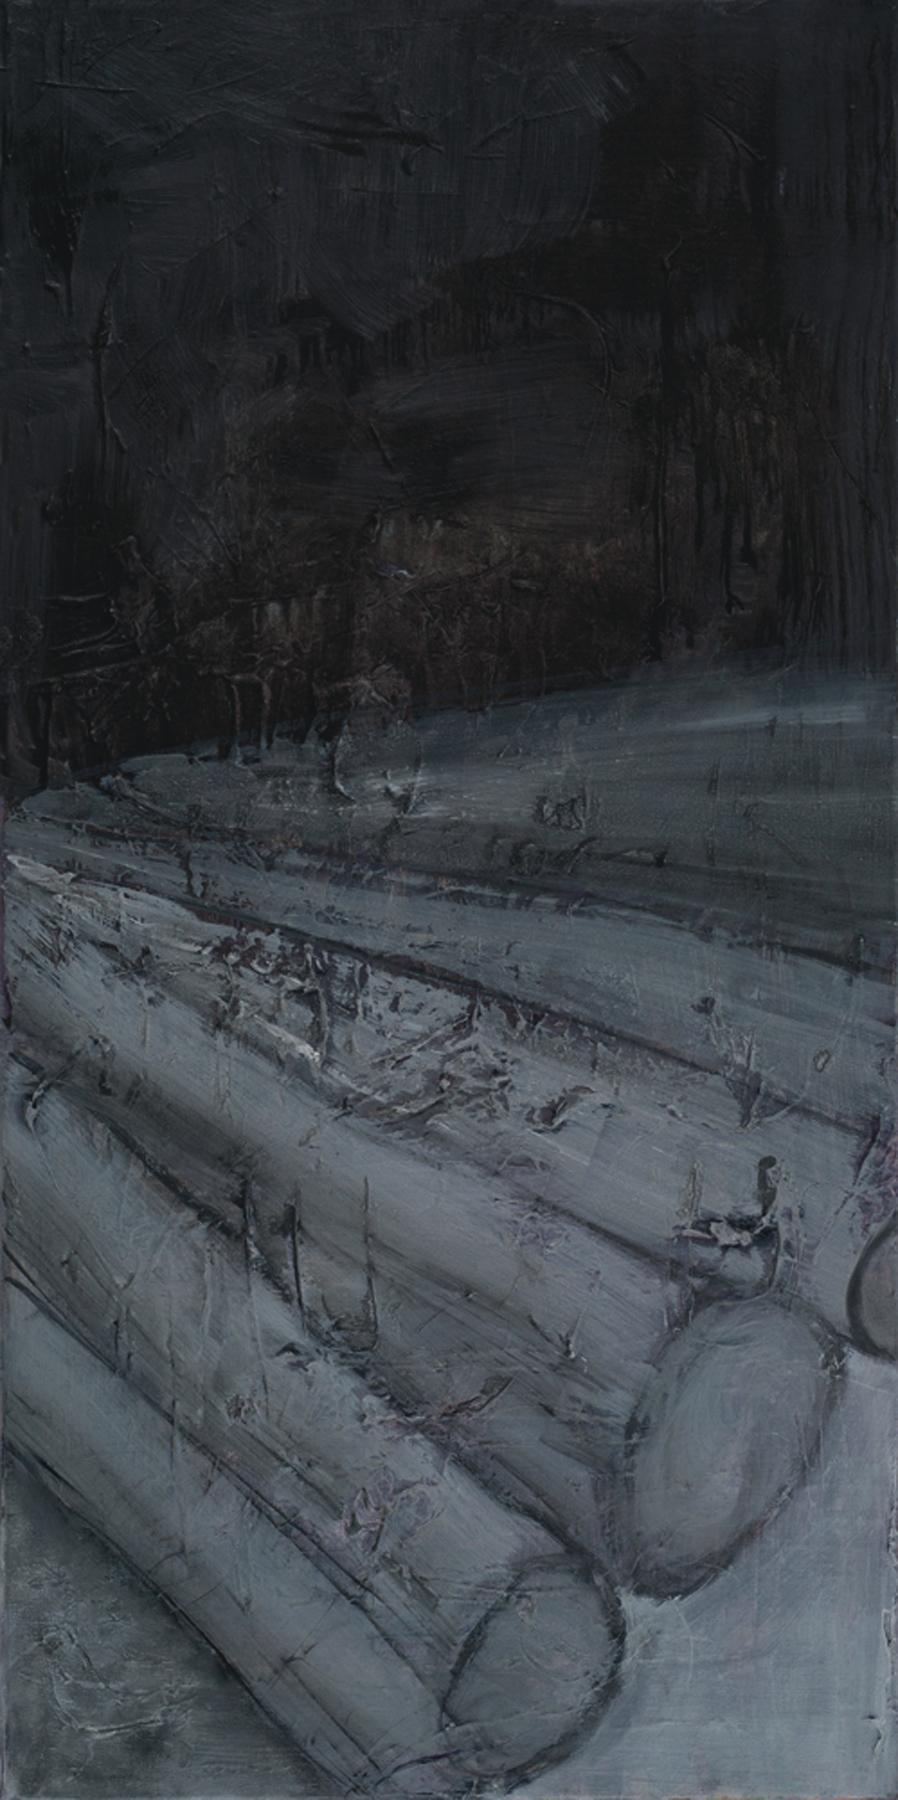 Karen Rothman, Degradation 1 , oil on canvas,18 x 36, $5,000